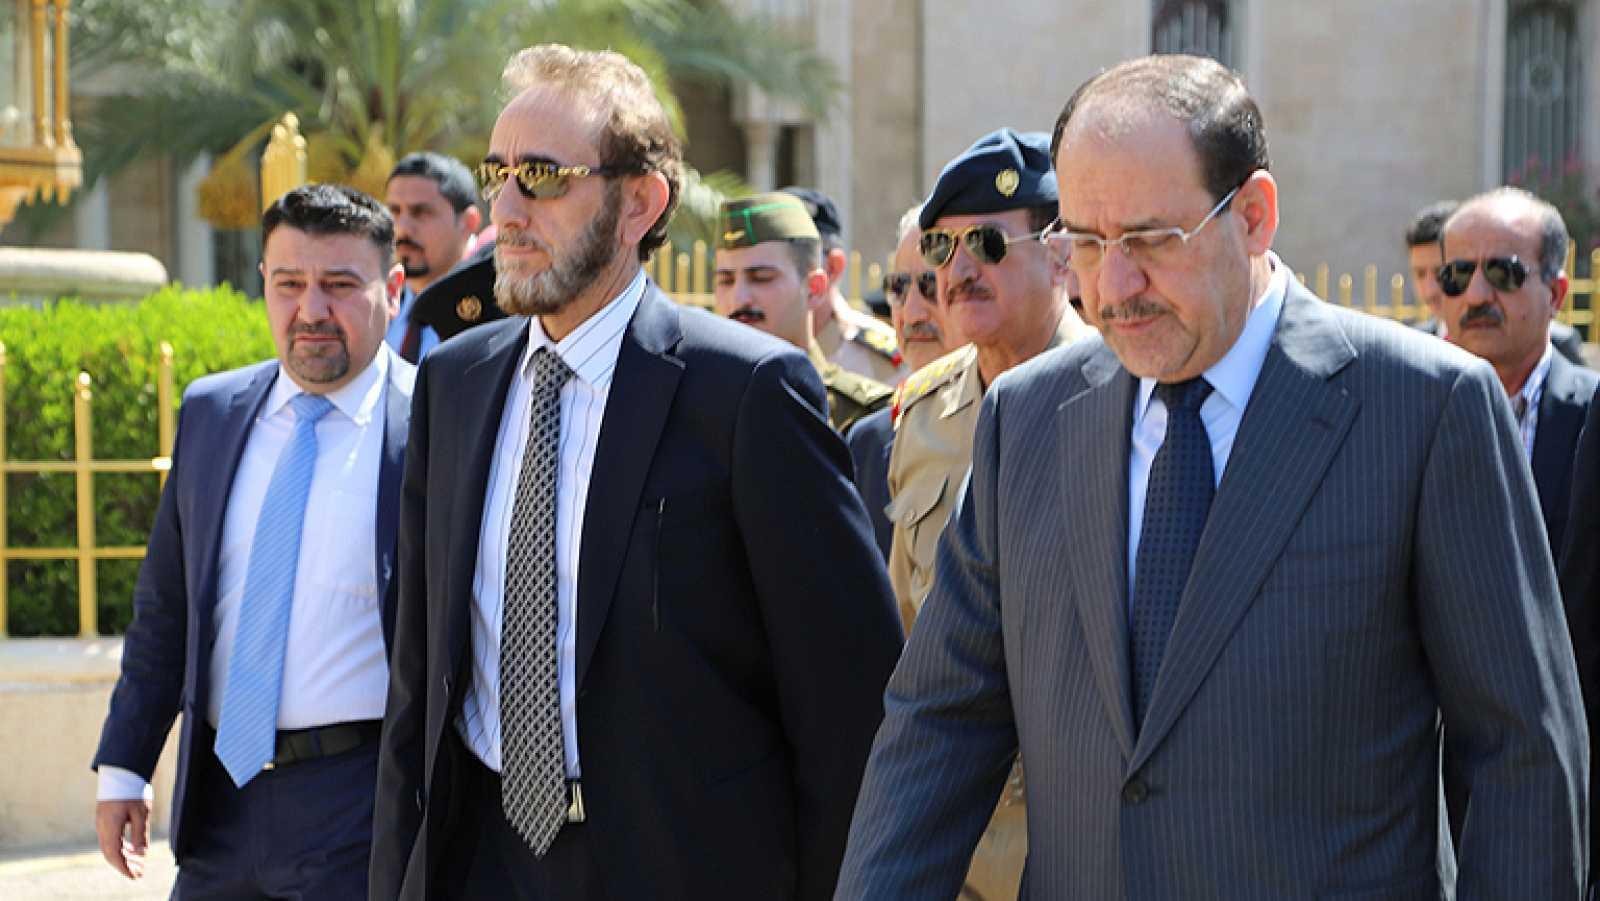 La renuncia de Al Maliki despeja el panorama en Irak